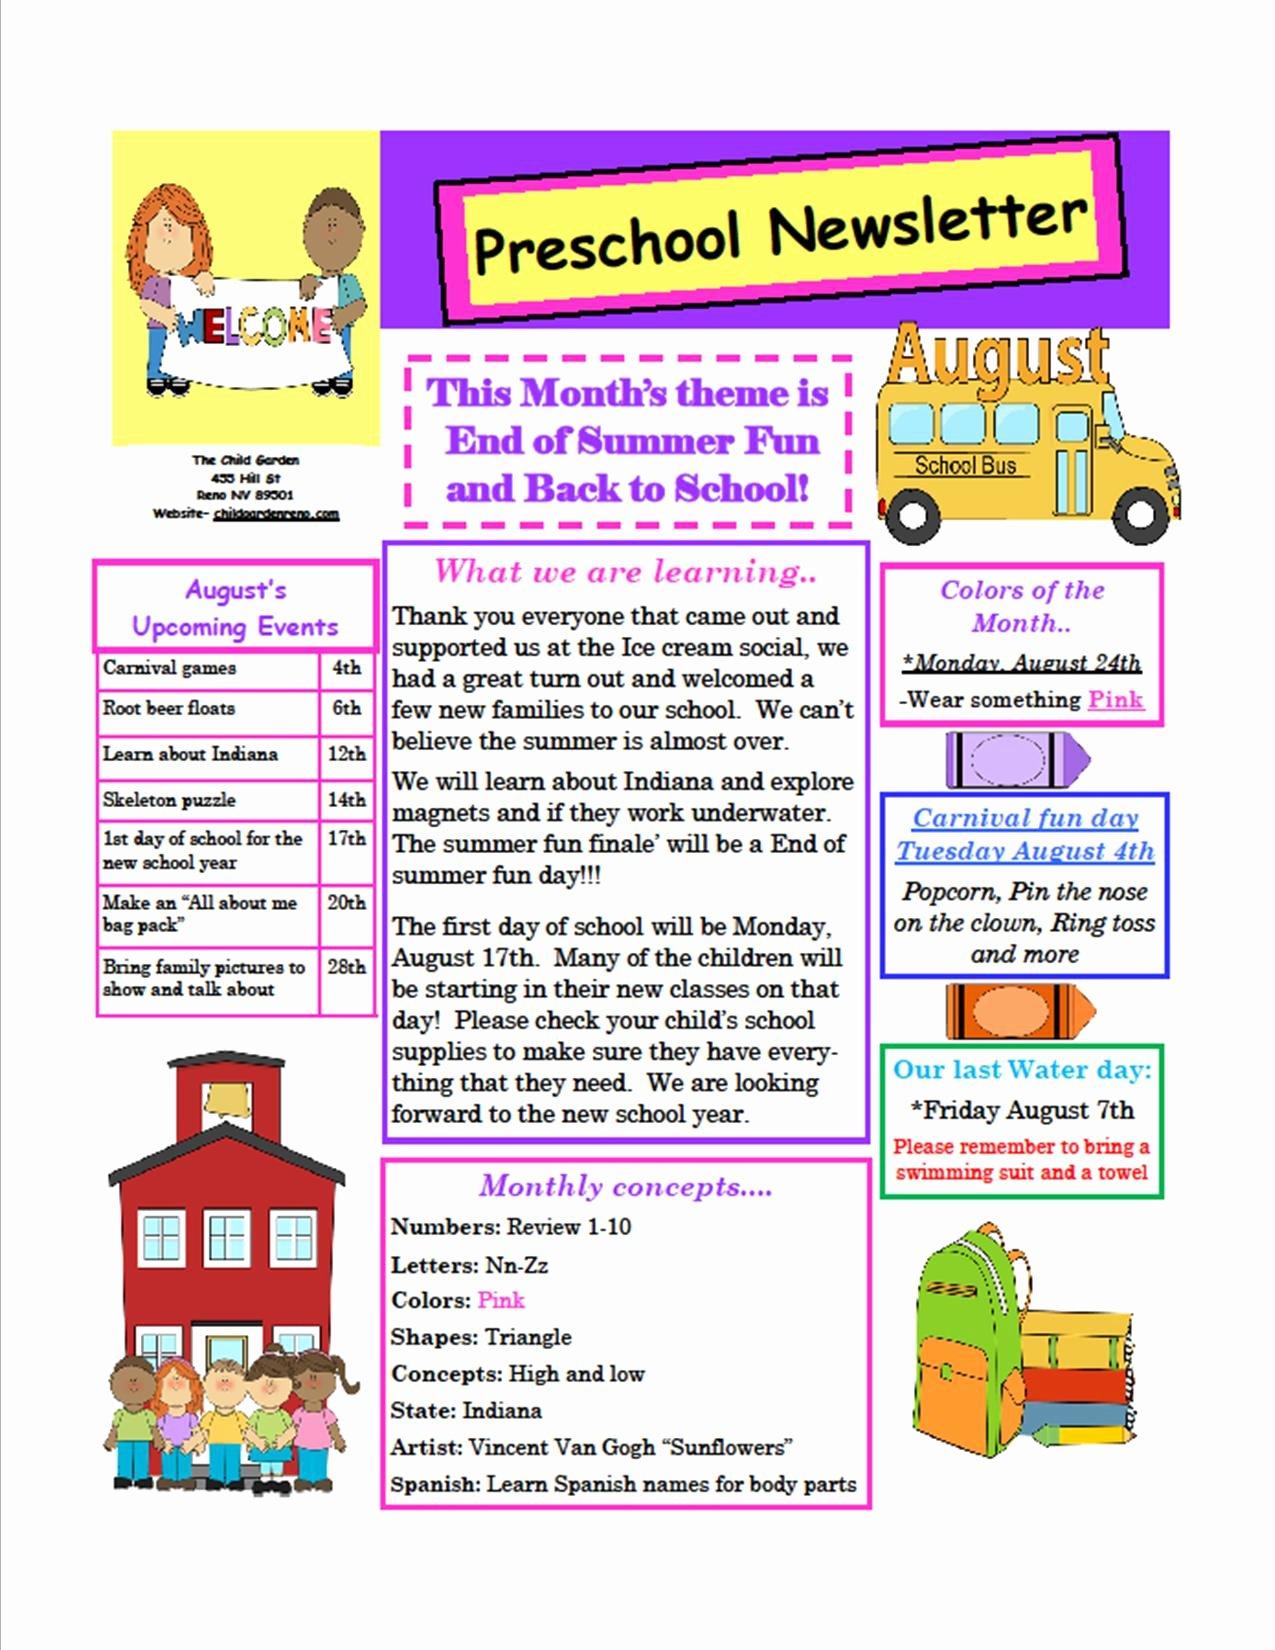 Preschool Weekly Newsletter Template Fresh the Child Garden Preschool